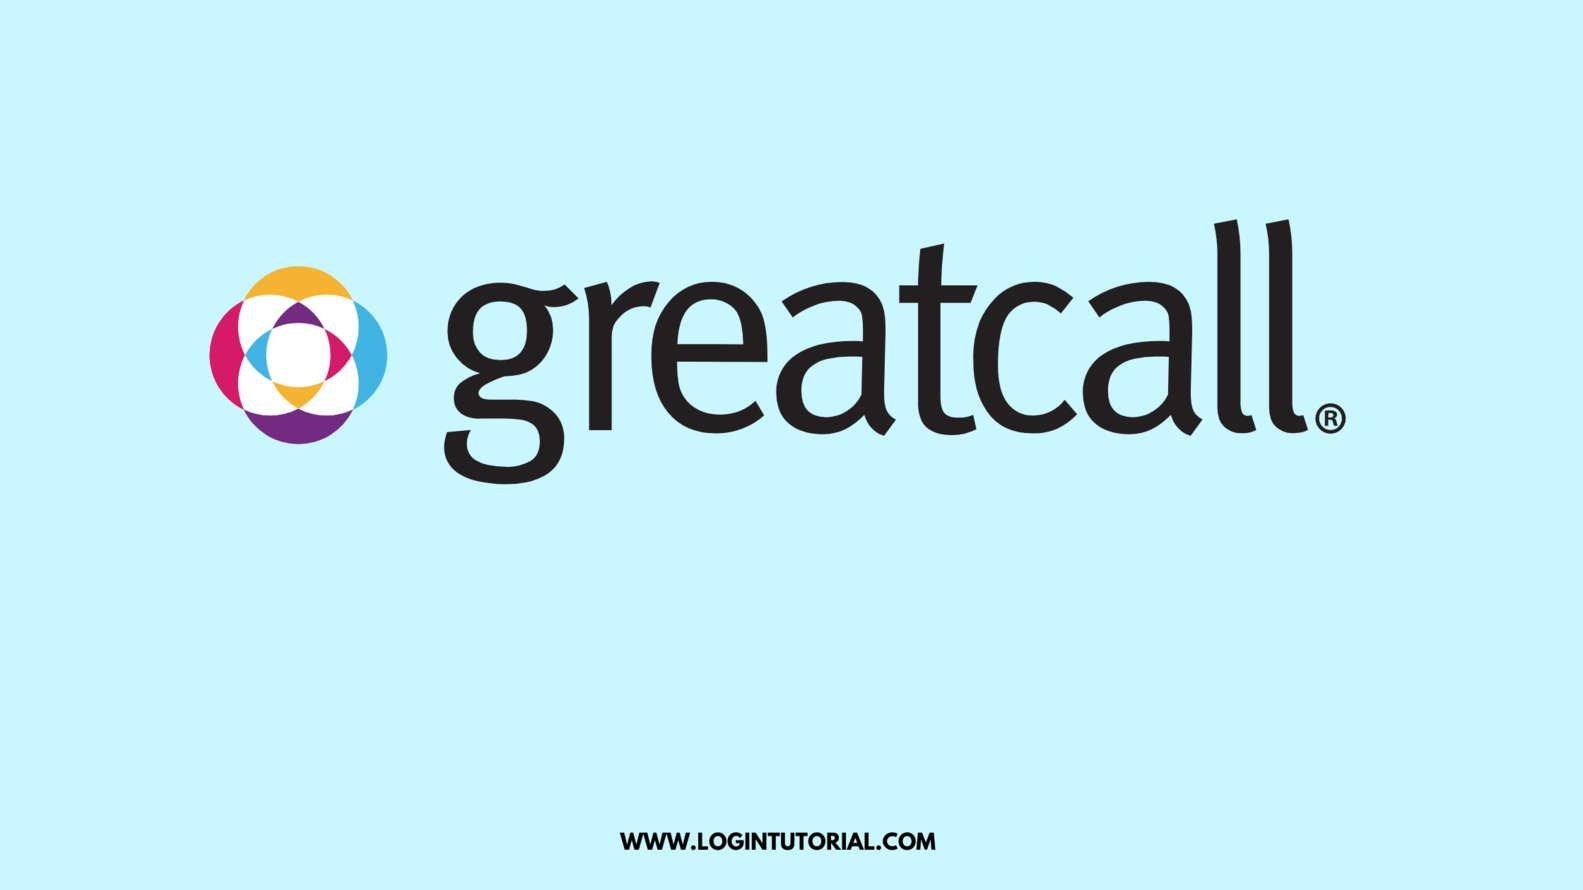 GreatCall - MyGreatCall Login